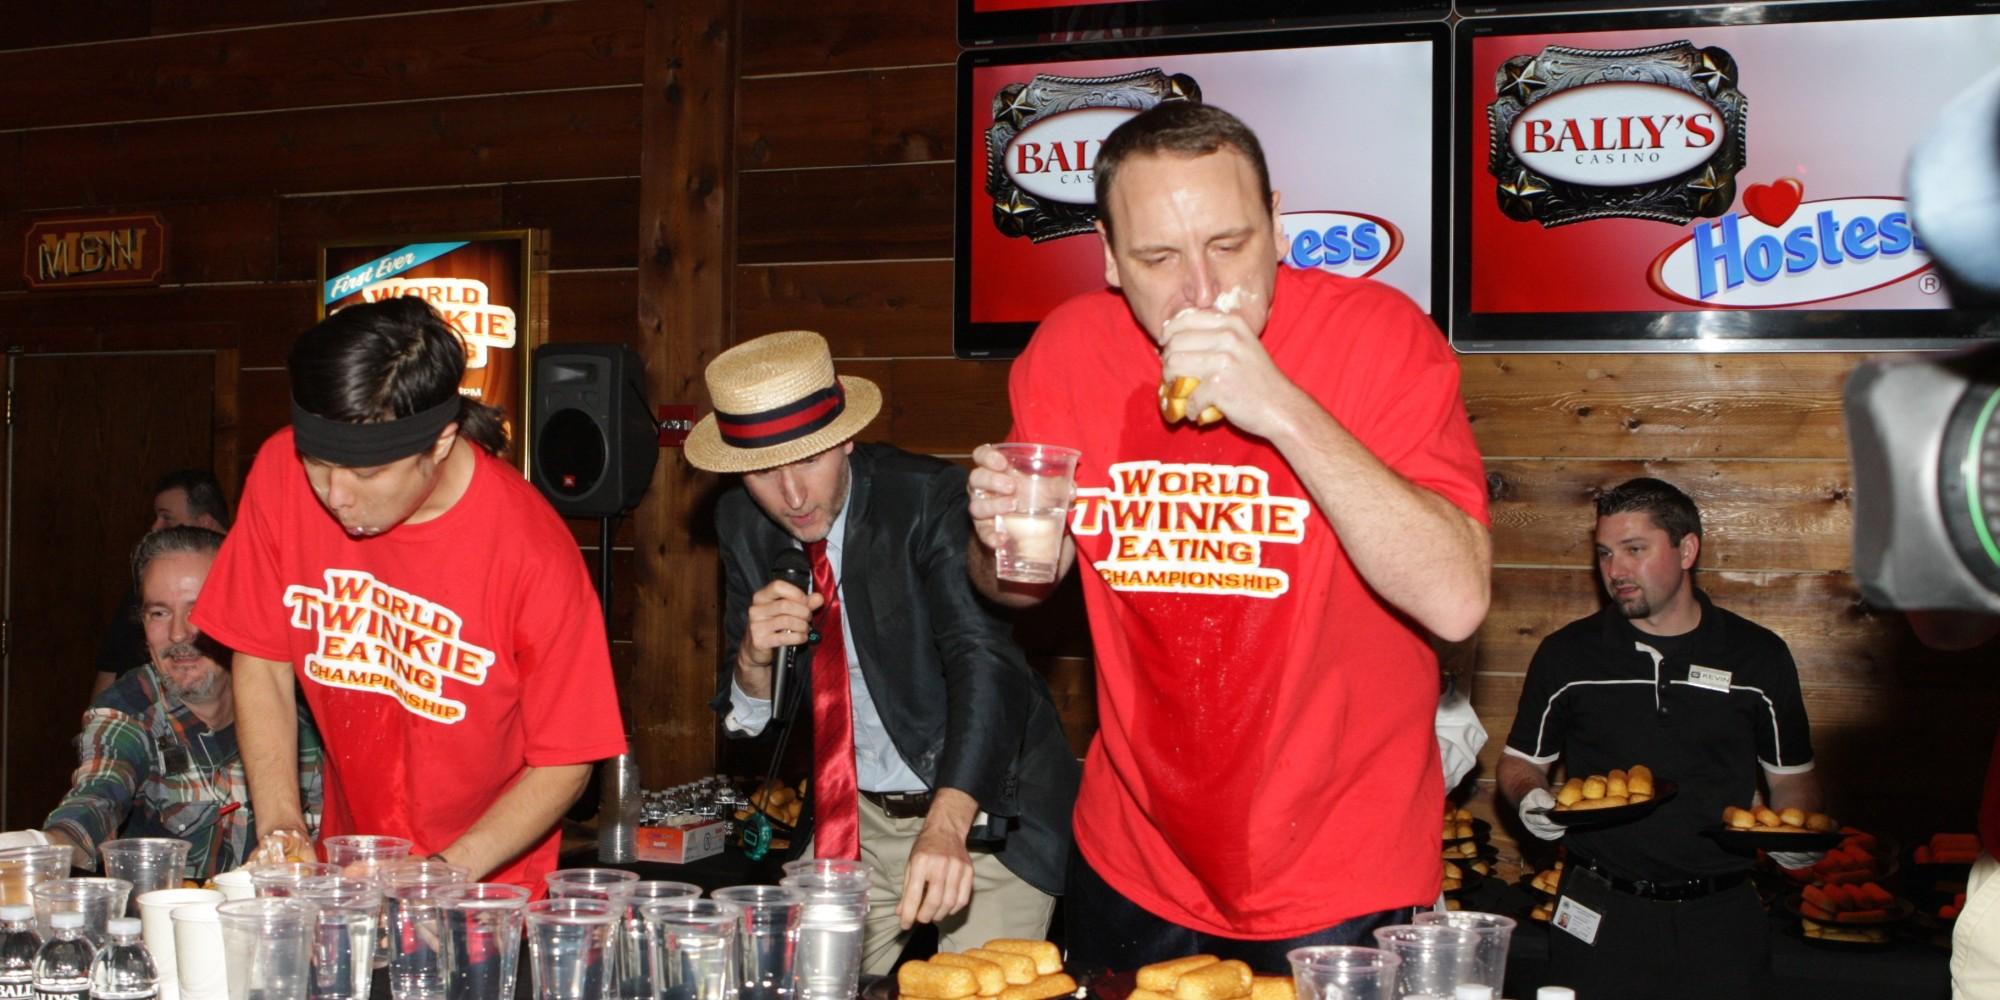 twinkie-eating-championship